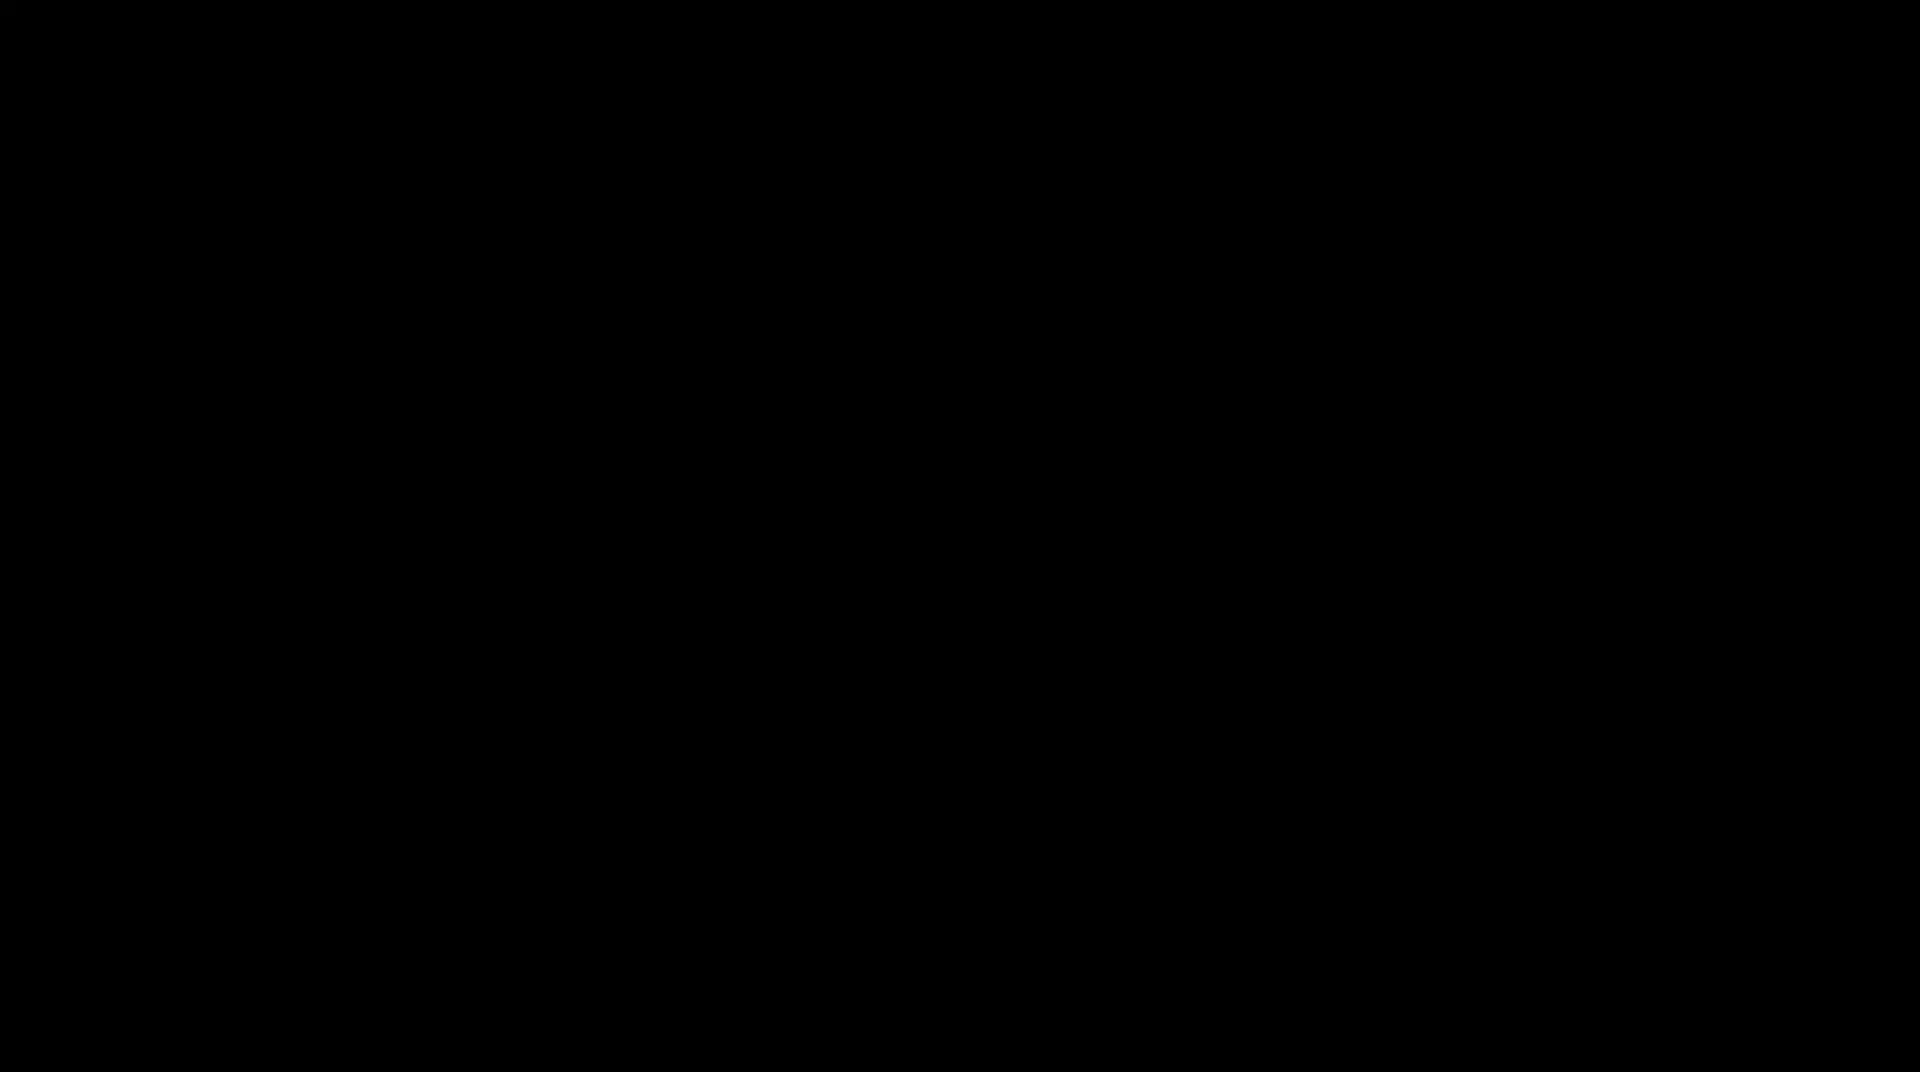 #SwordArtOnline, Entertainment, Rimuru Tempest, Sword Art Online Alicization Opening 2 V3 | 1080p GIFs